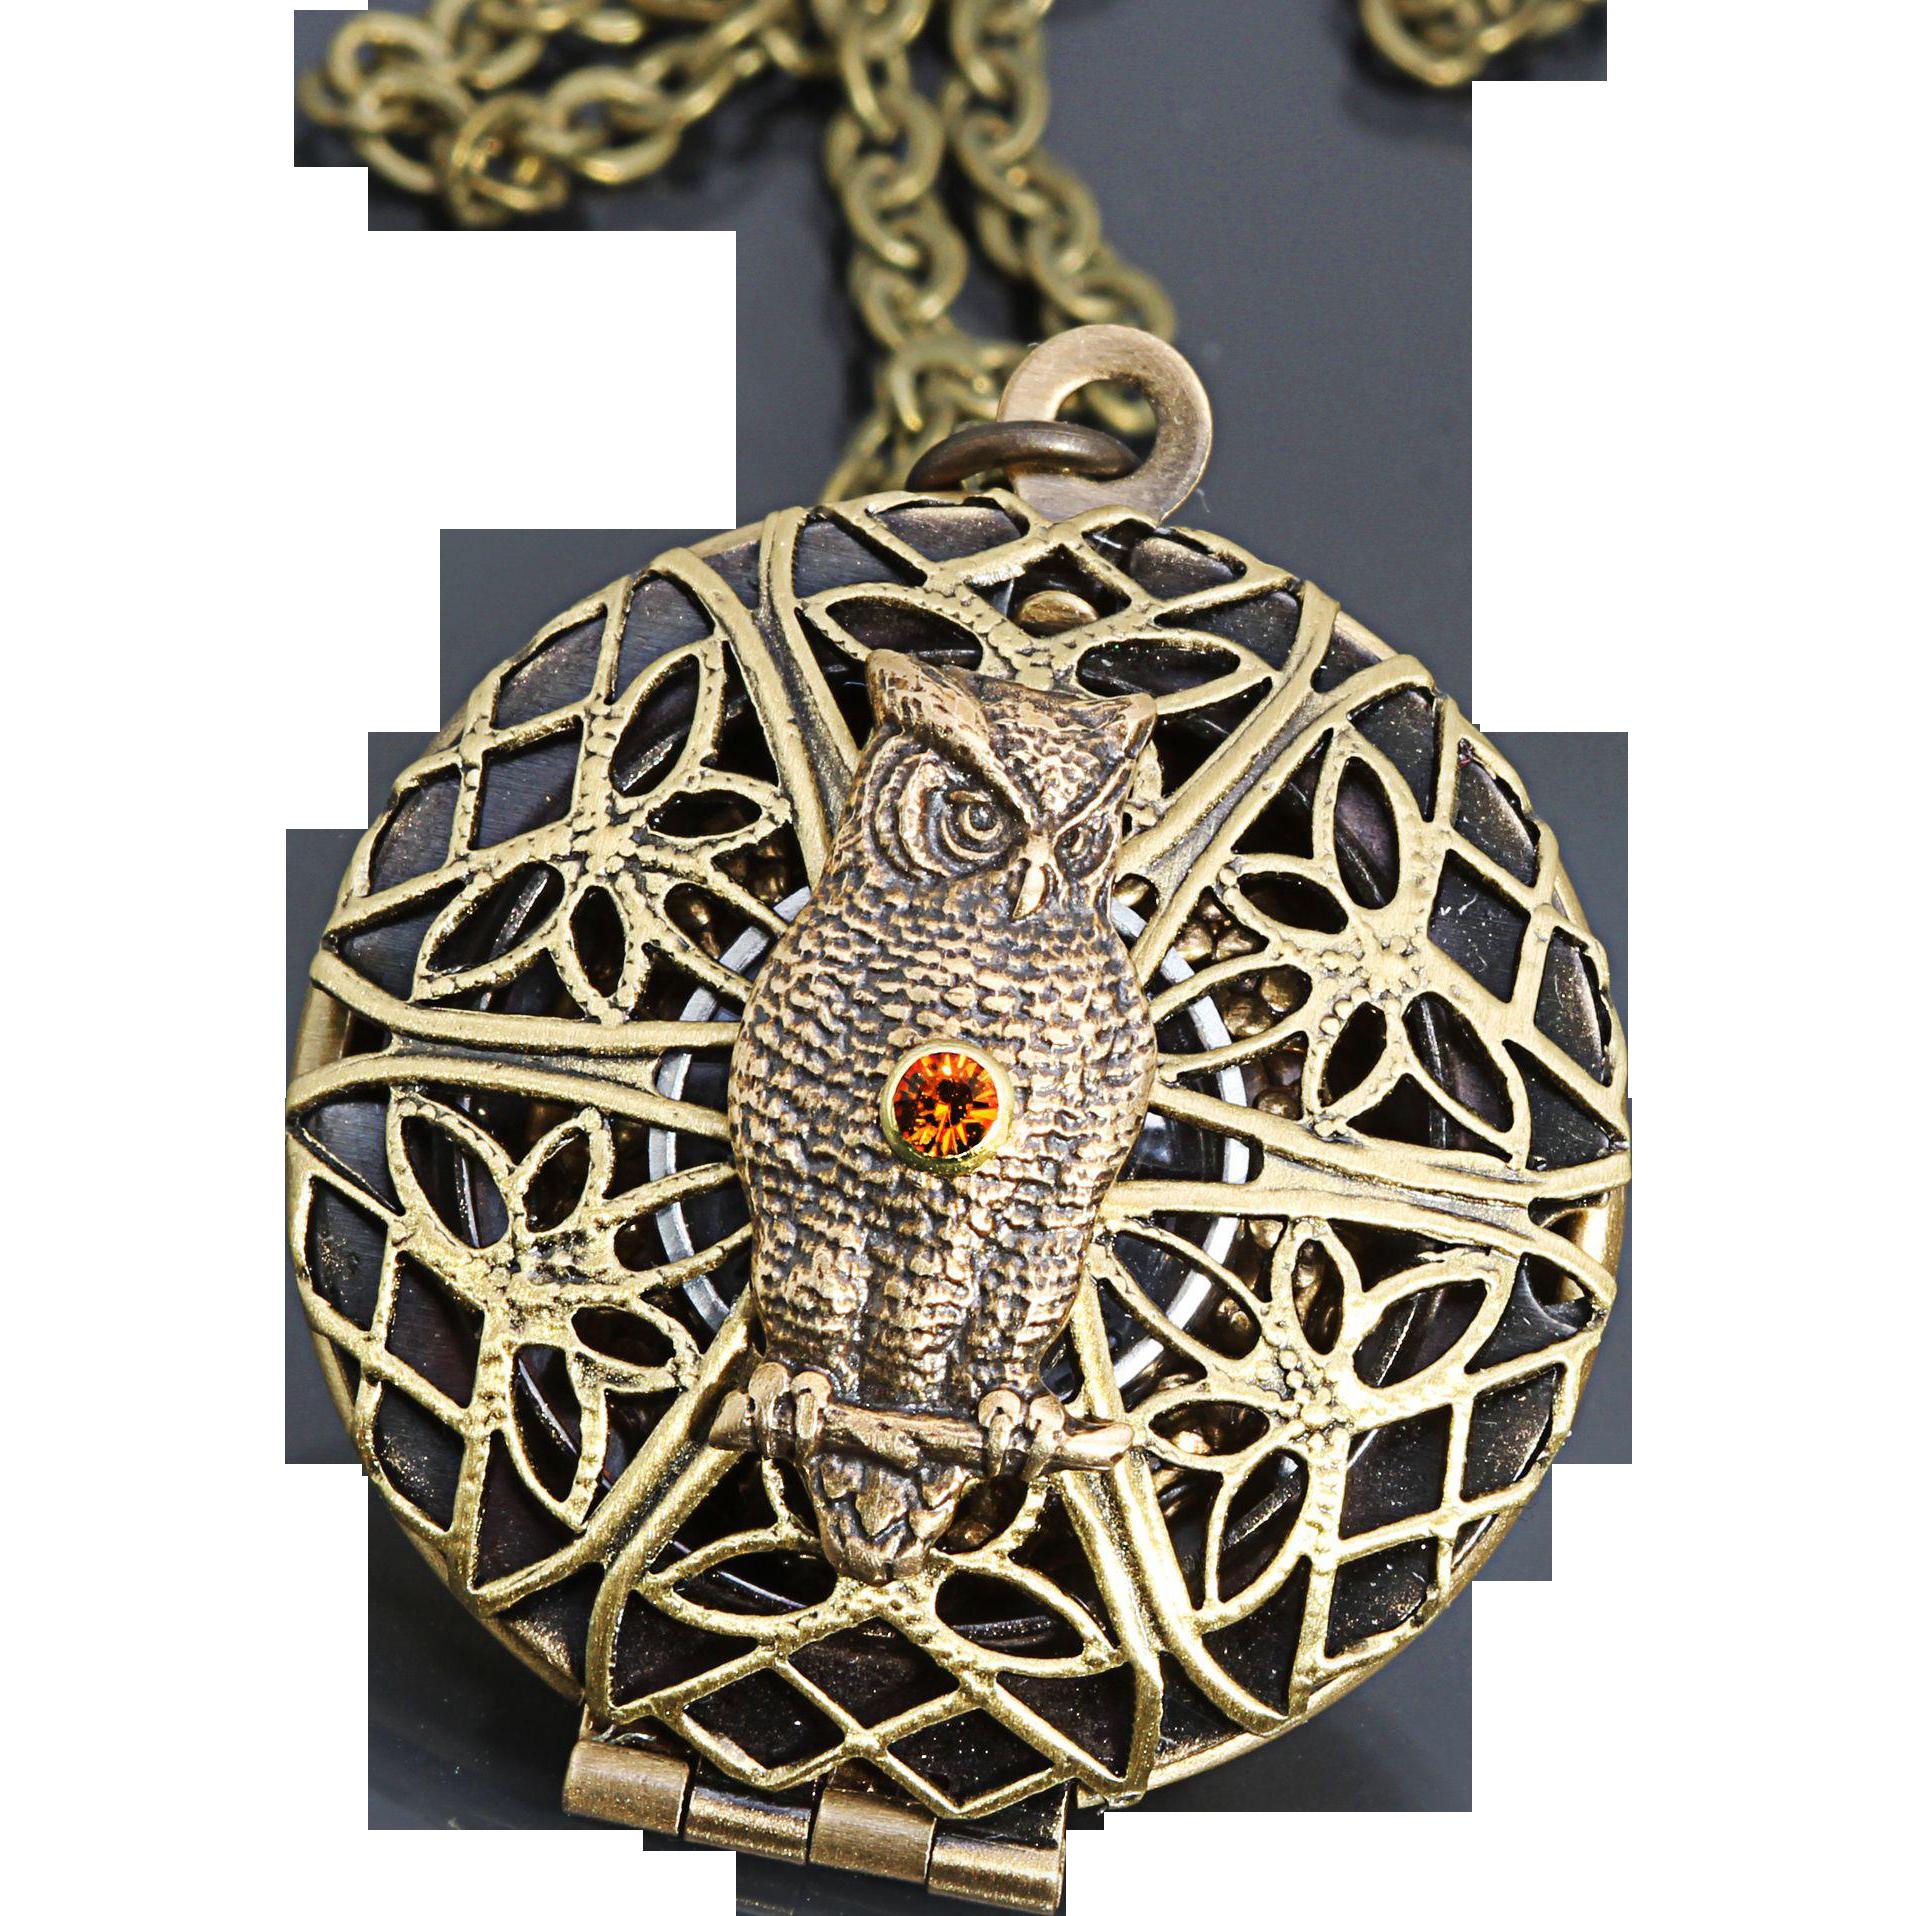 Compass Necklace Owl Locket Necklace Compass Locket Owl Pendant Necklace